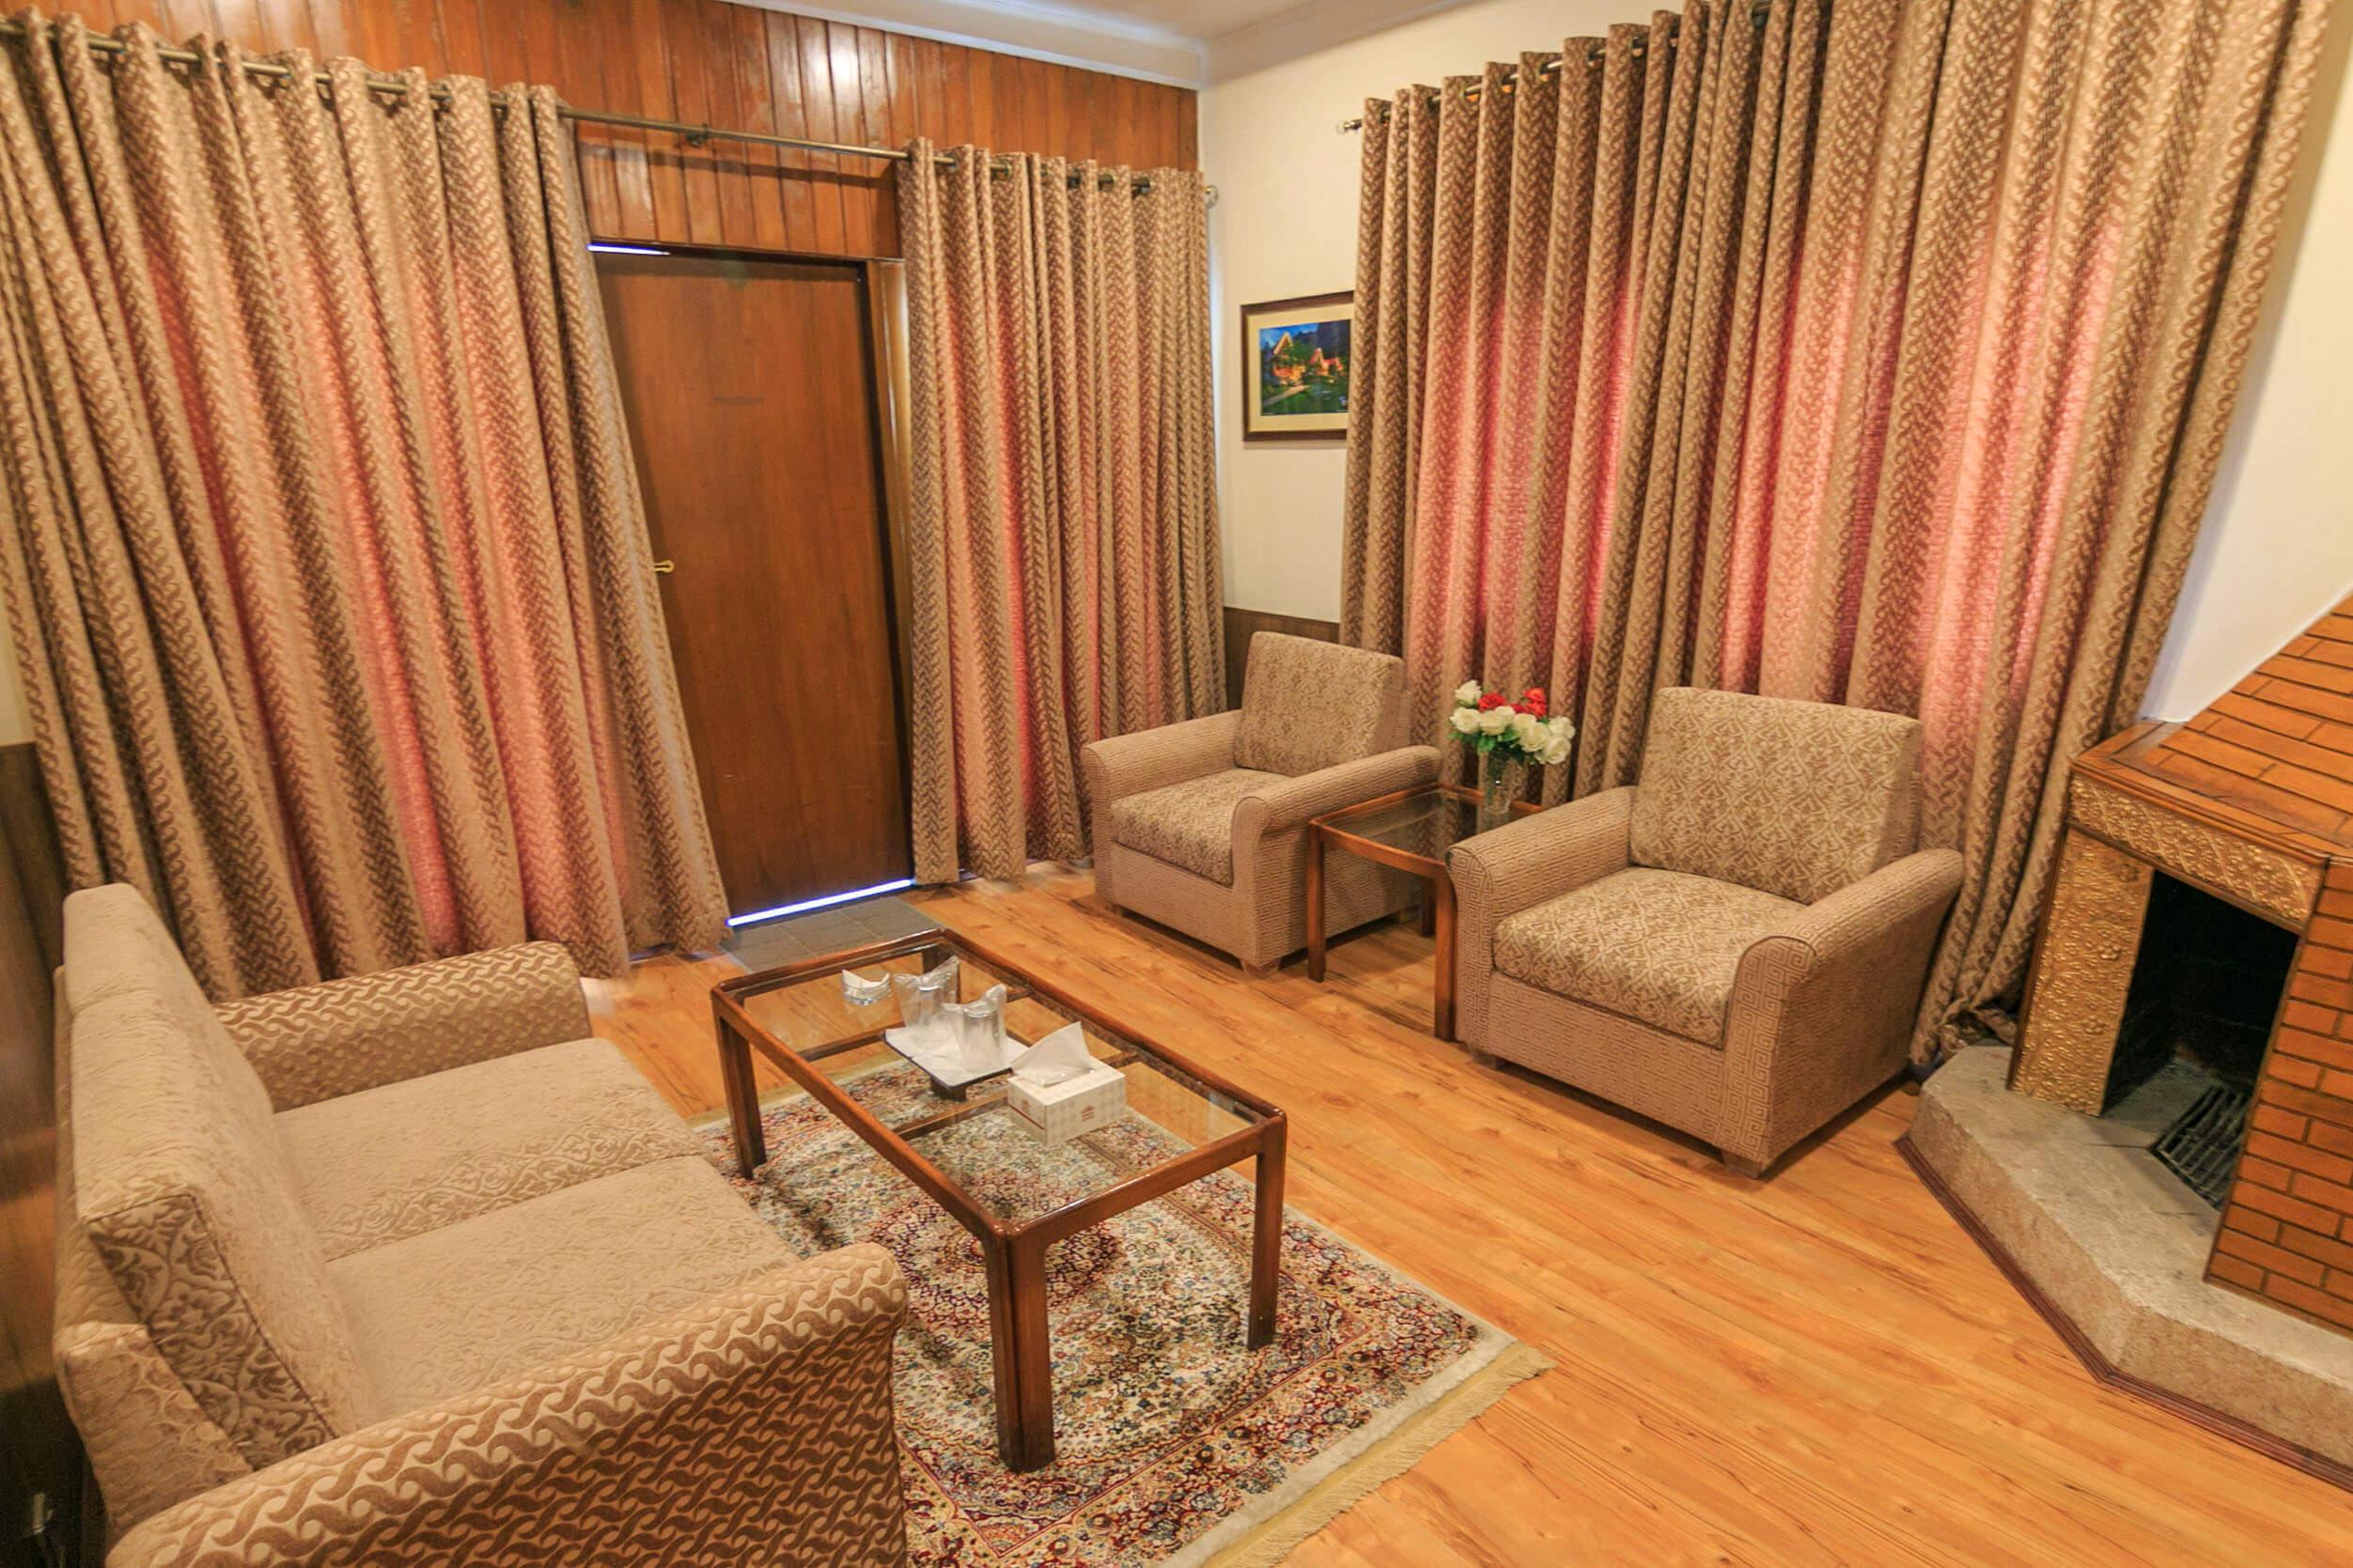 SHANGRILA RESORT HOTEL SKARDU 7